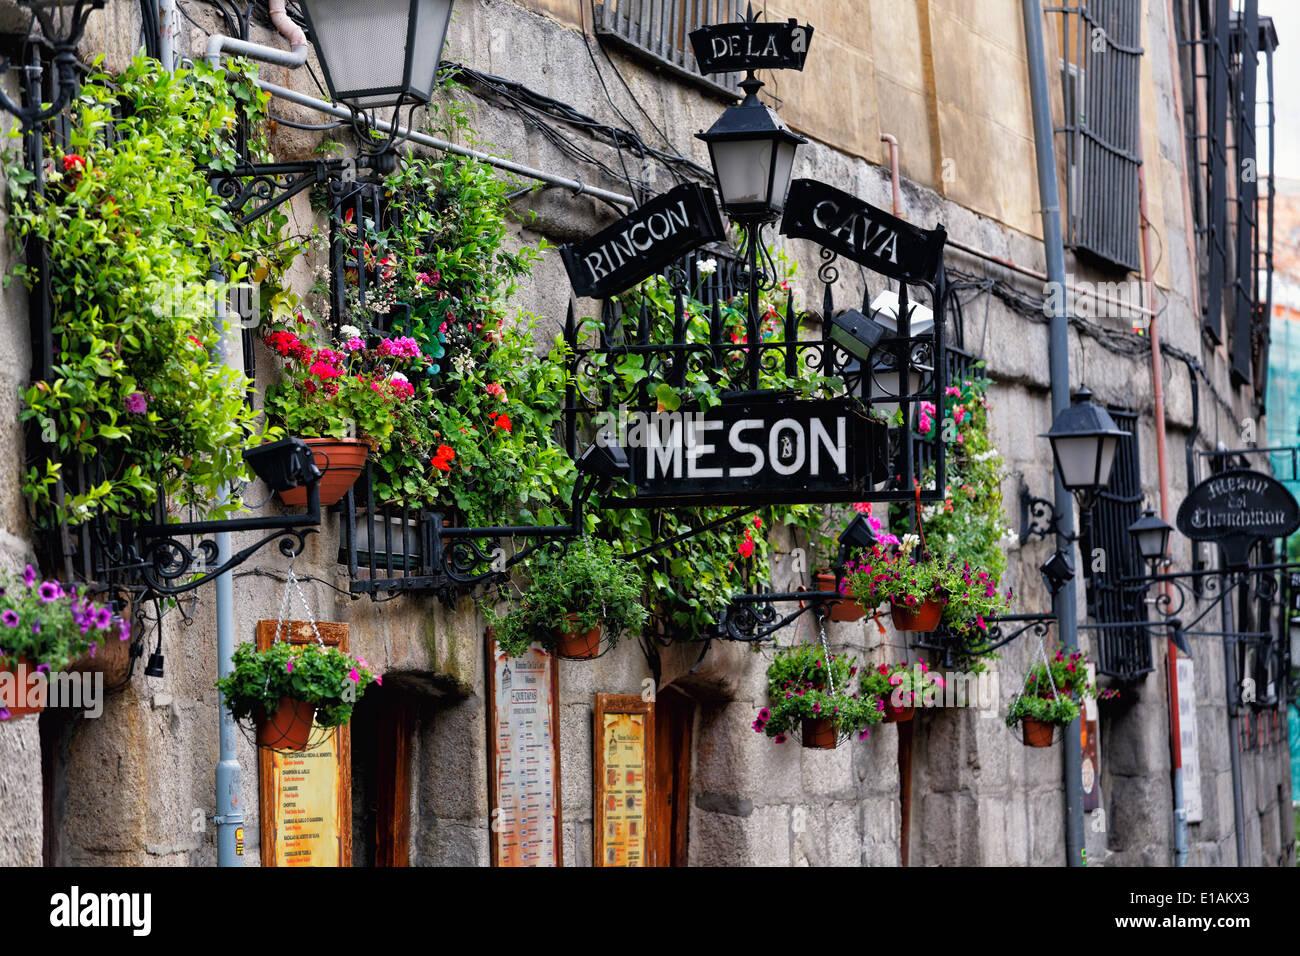 Entrance Signs of Tapas Restaurant, Mesón Rincón de la Cavas, Madrid, Spain. - Stock Image